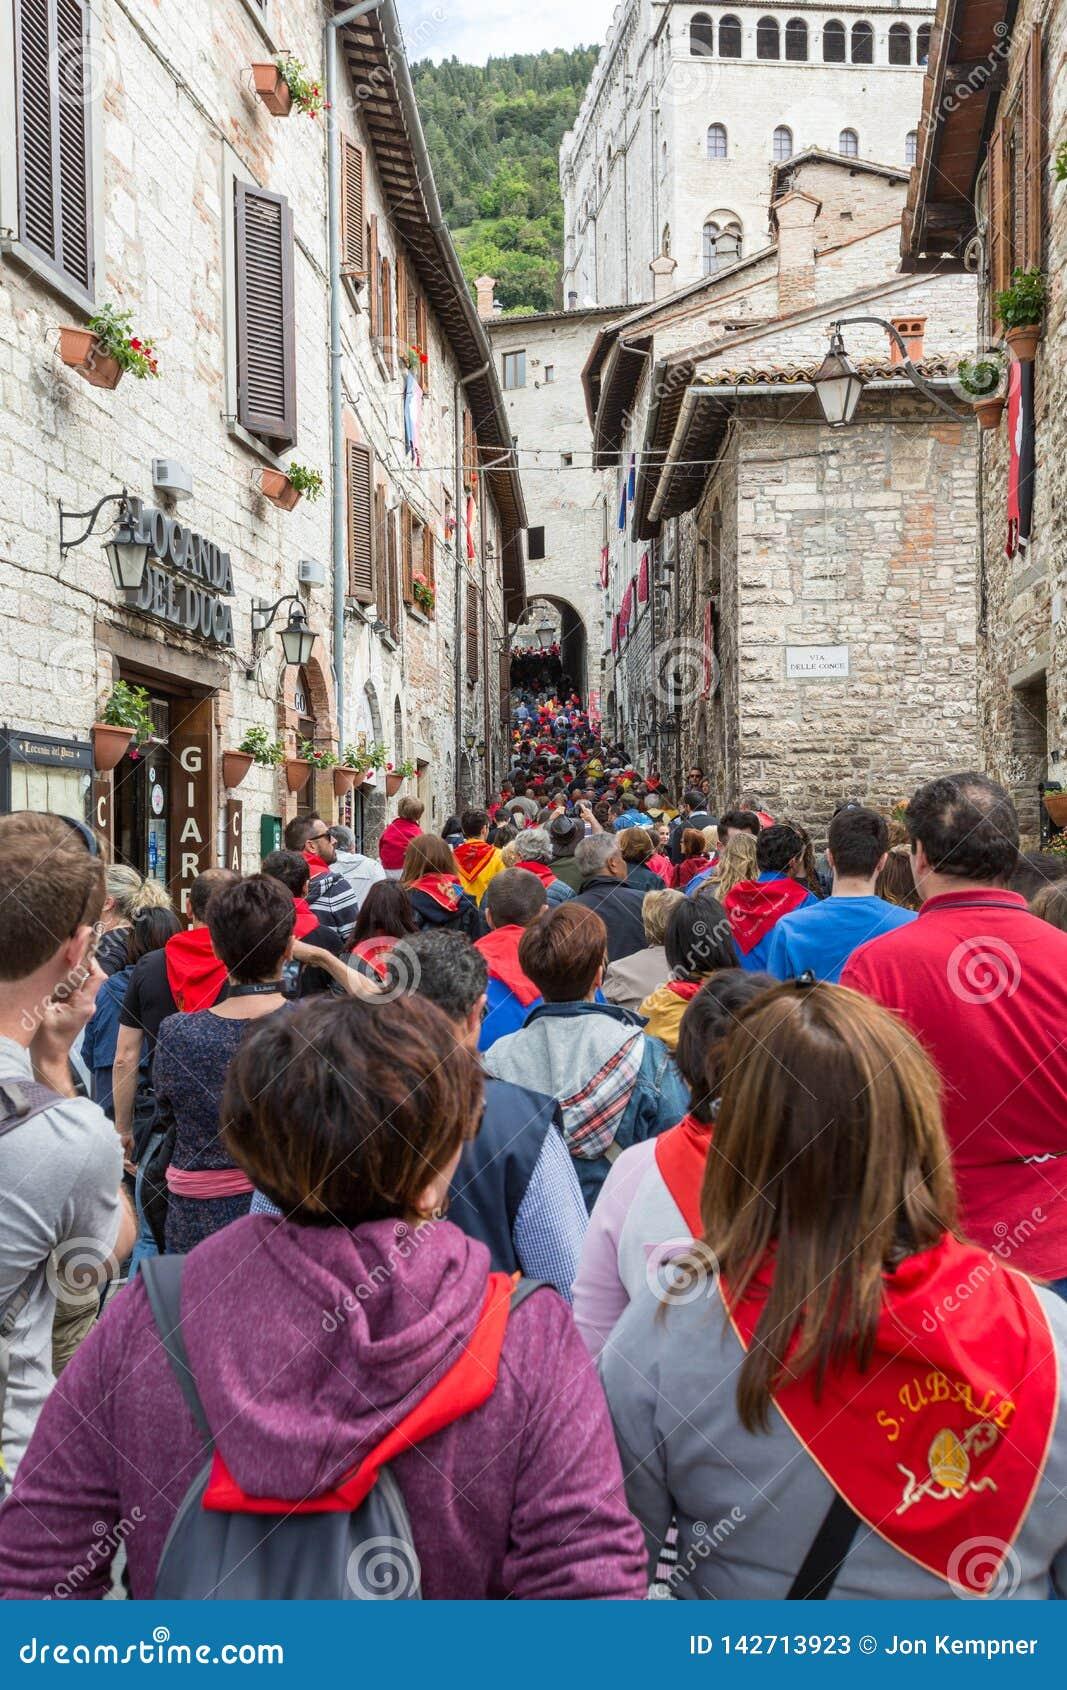 GUBBIO, ΙΤΑΛΊΑ - 15 ΜΑΐΟΥ 2016 - πλήθη αποτελεί τον τρόπο τους τις στενές οδούς σε Gubbio προς την πλατεία Grande να προσέξει τον